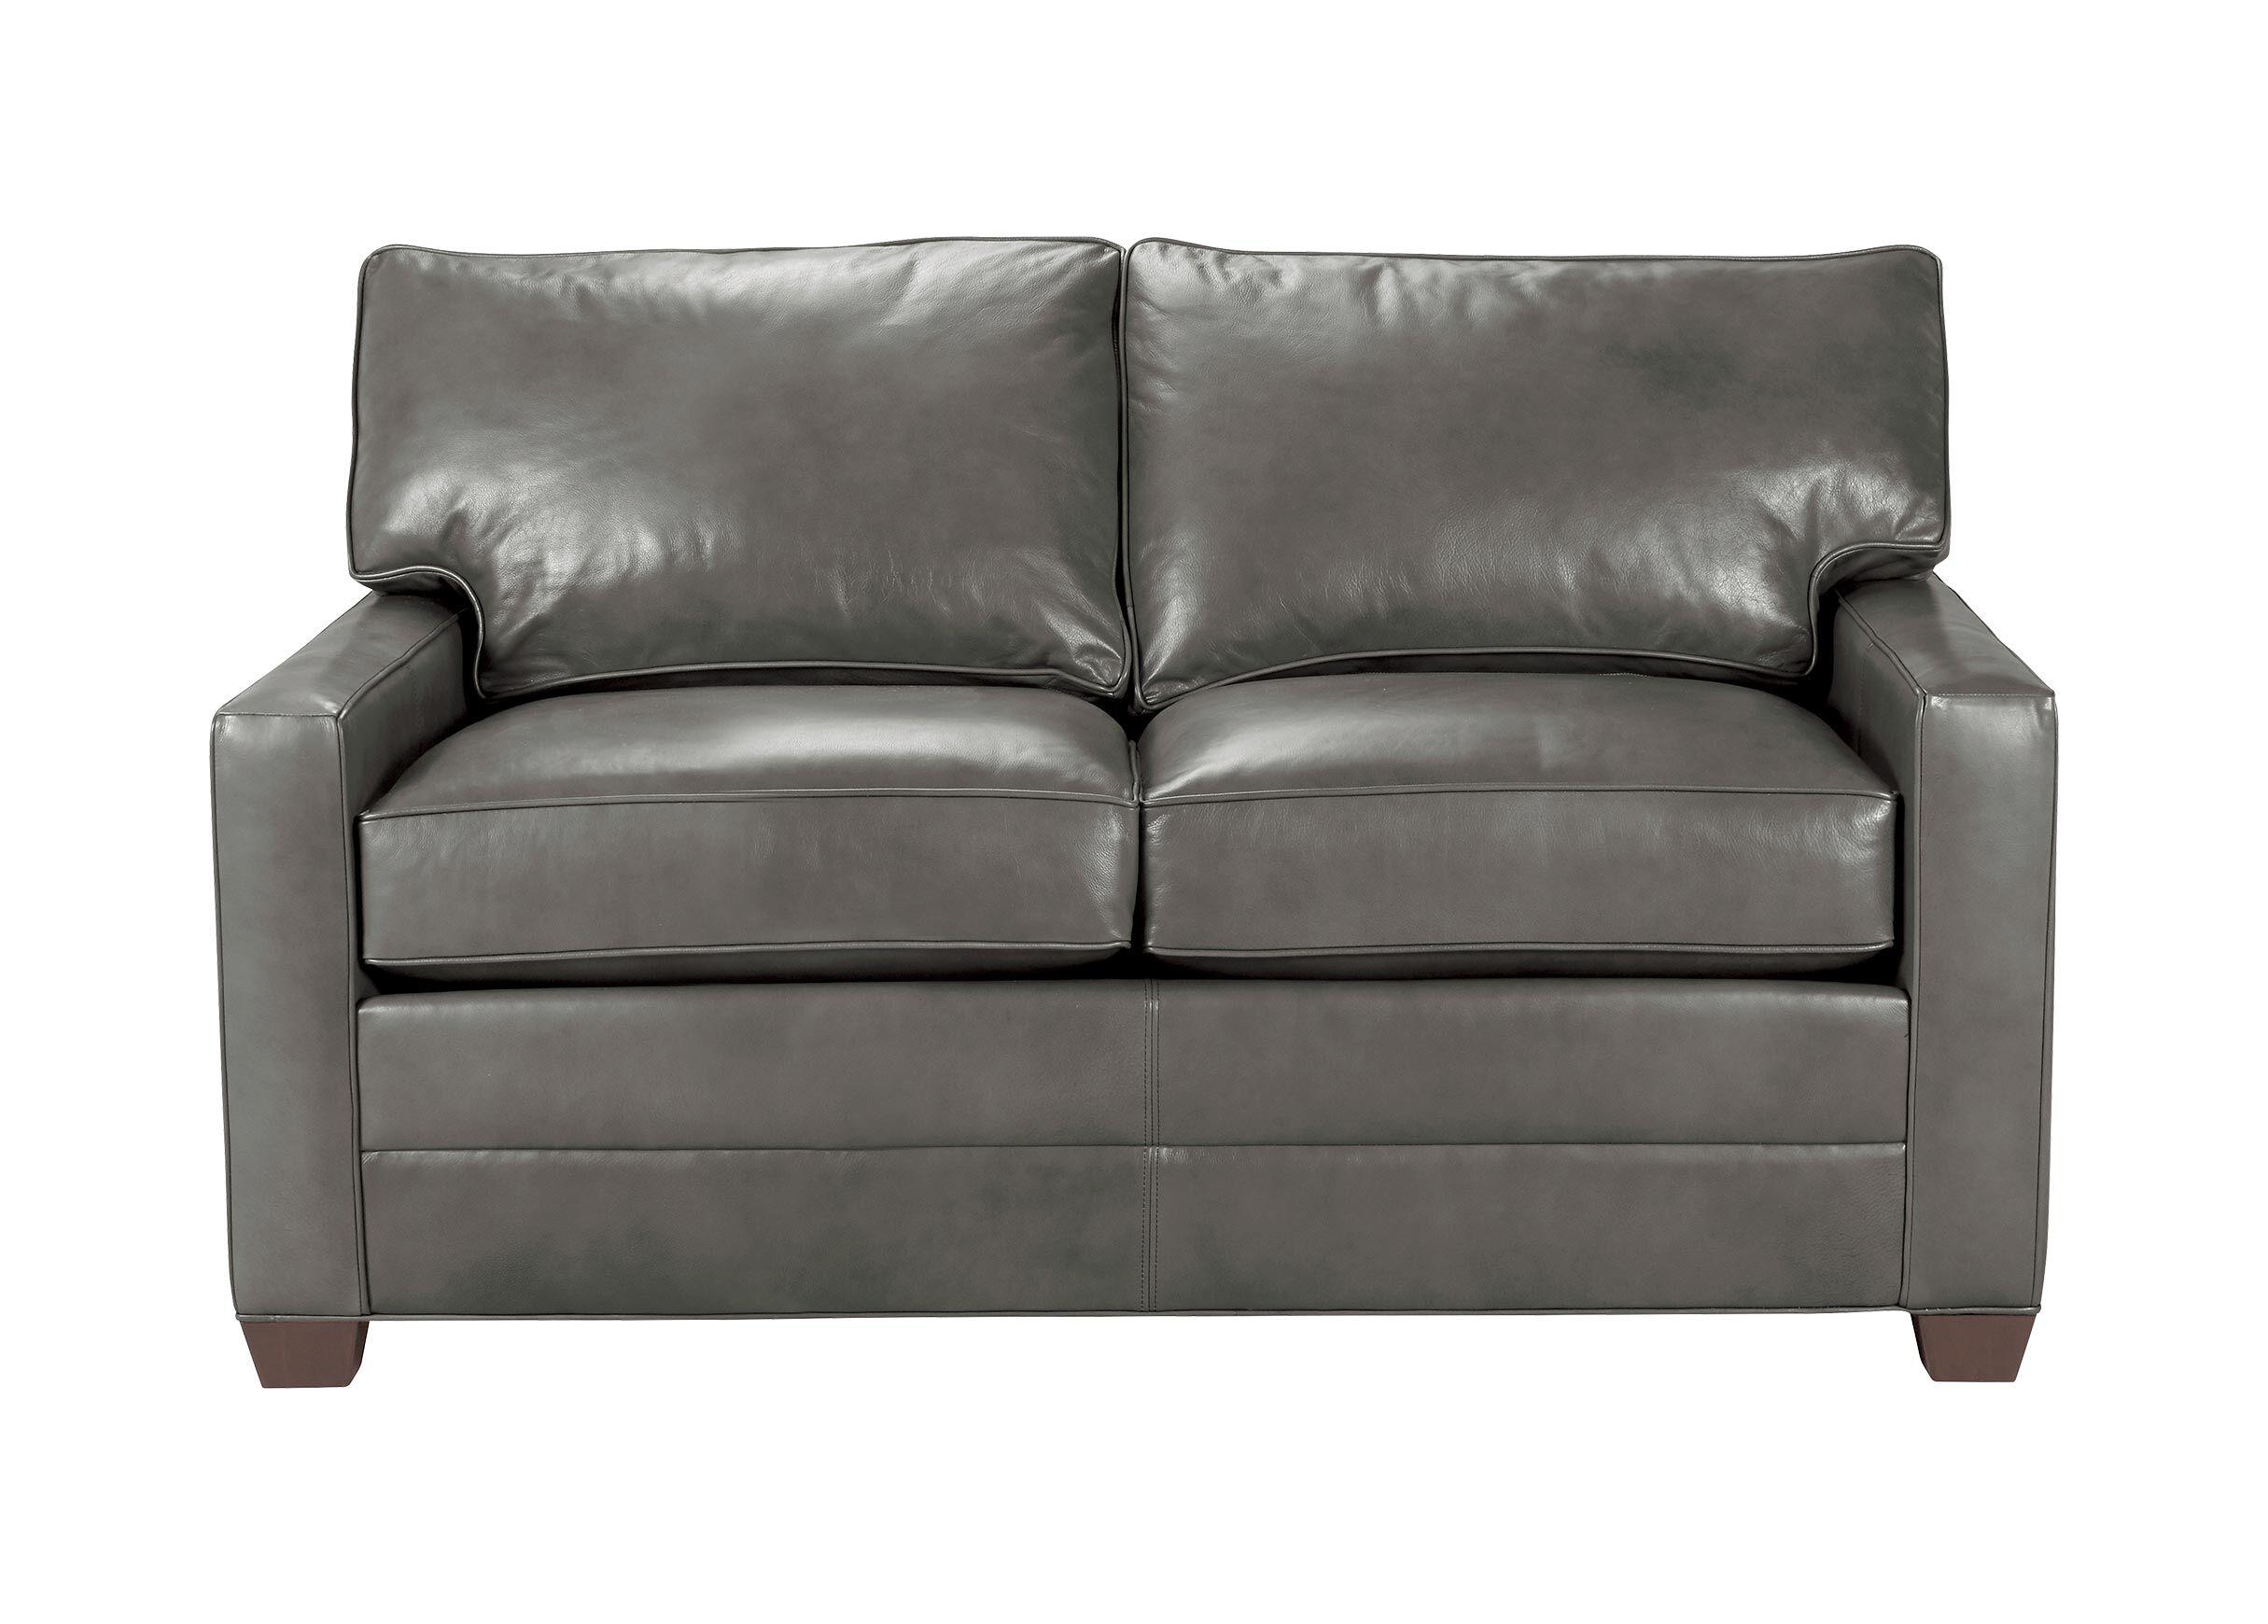 bennett leather sofa lawson cargo track arm sofas quick ship